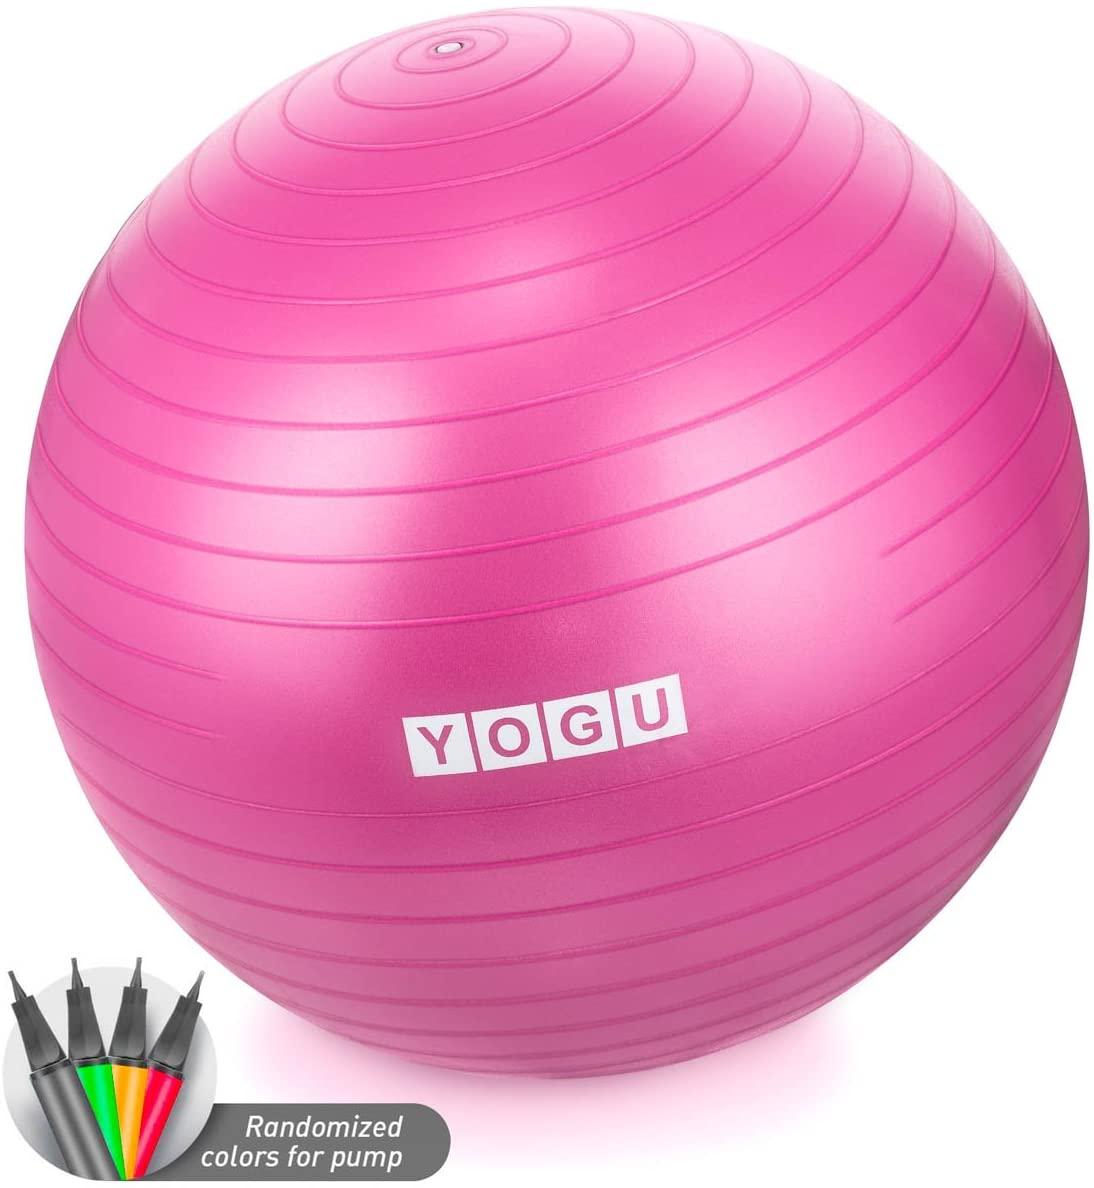 Yogu stability ball amazon